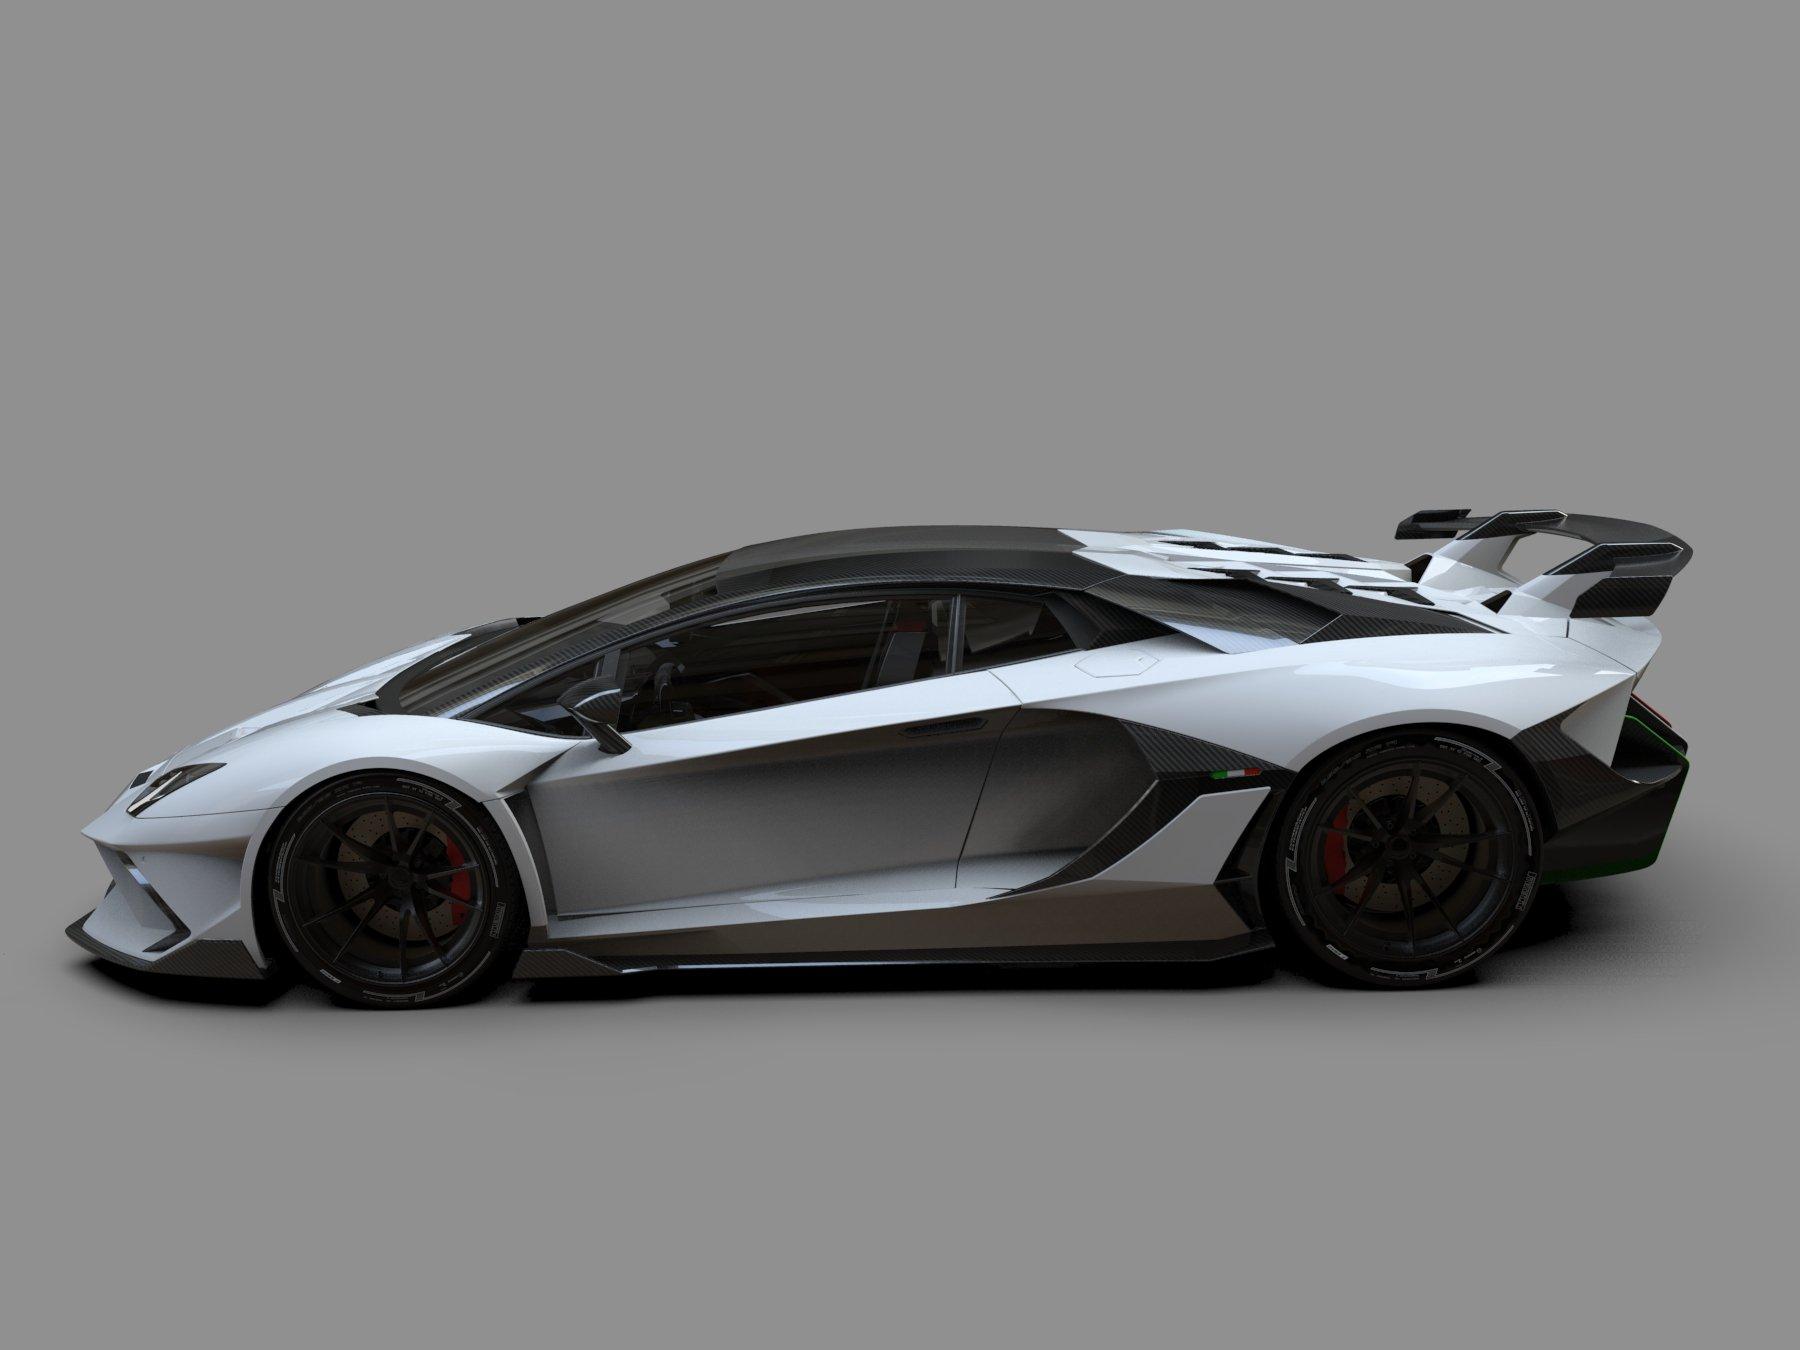 Lamborghini_Aventador_by_Duke_Dynamics_0015